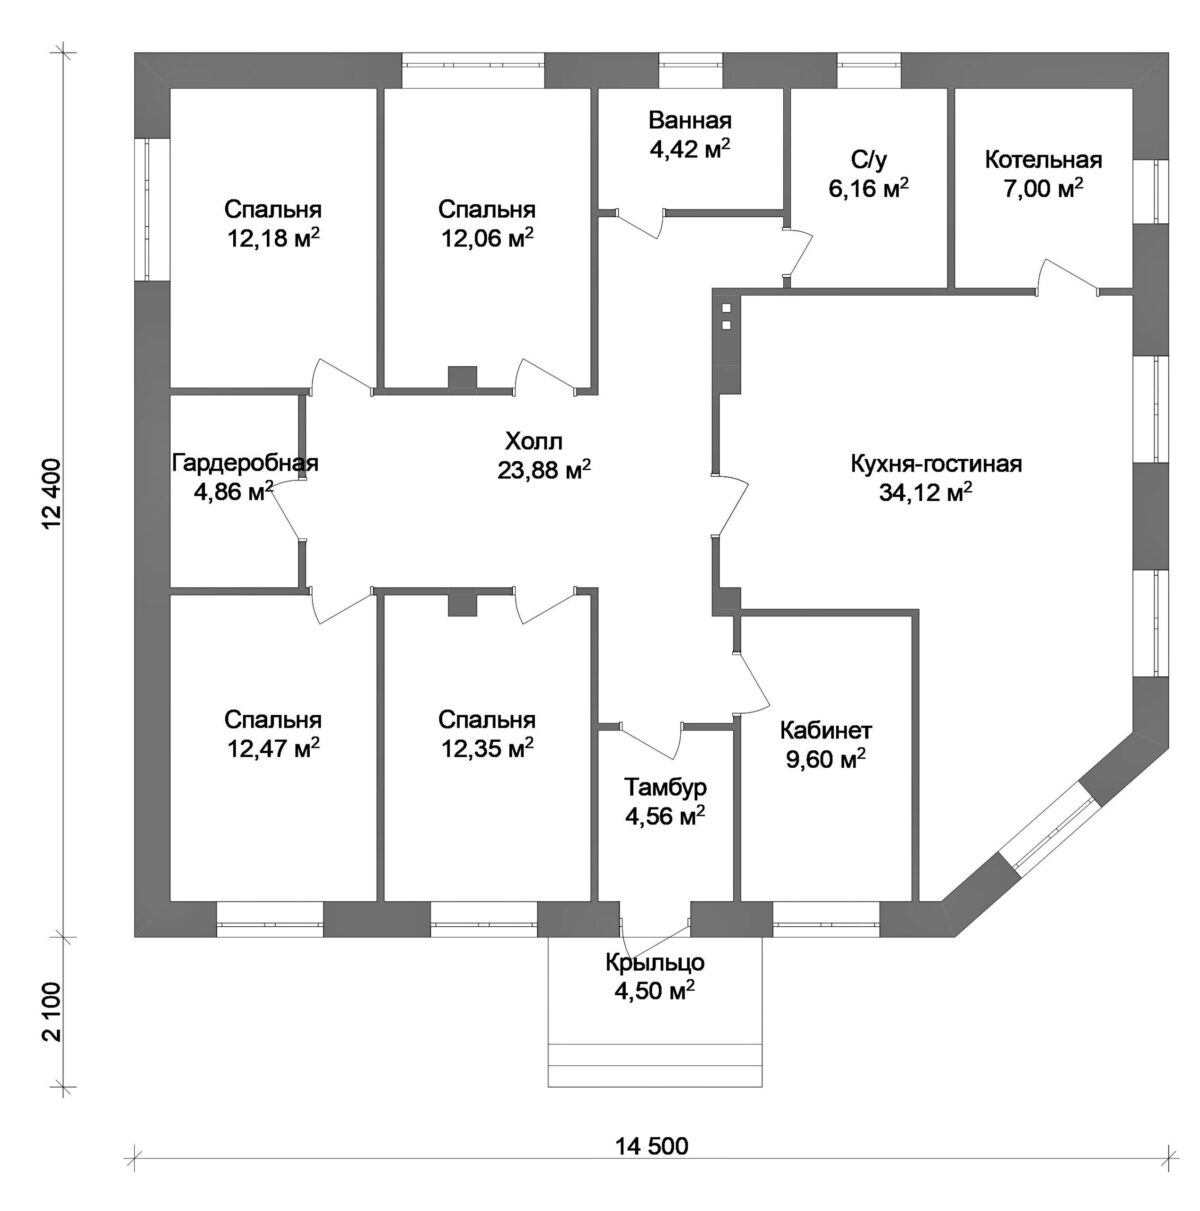 Тристан B-024. Проект квадратного одноэтажного дома на 4 спальни, с кабинетом